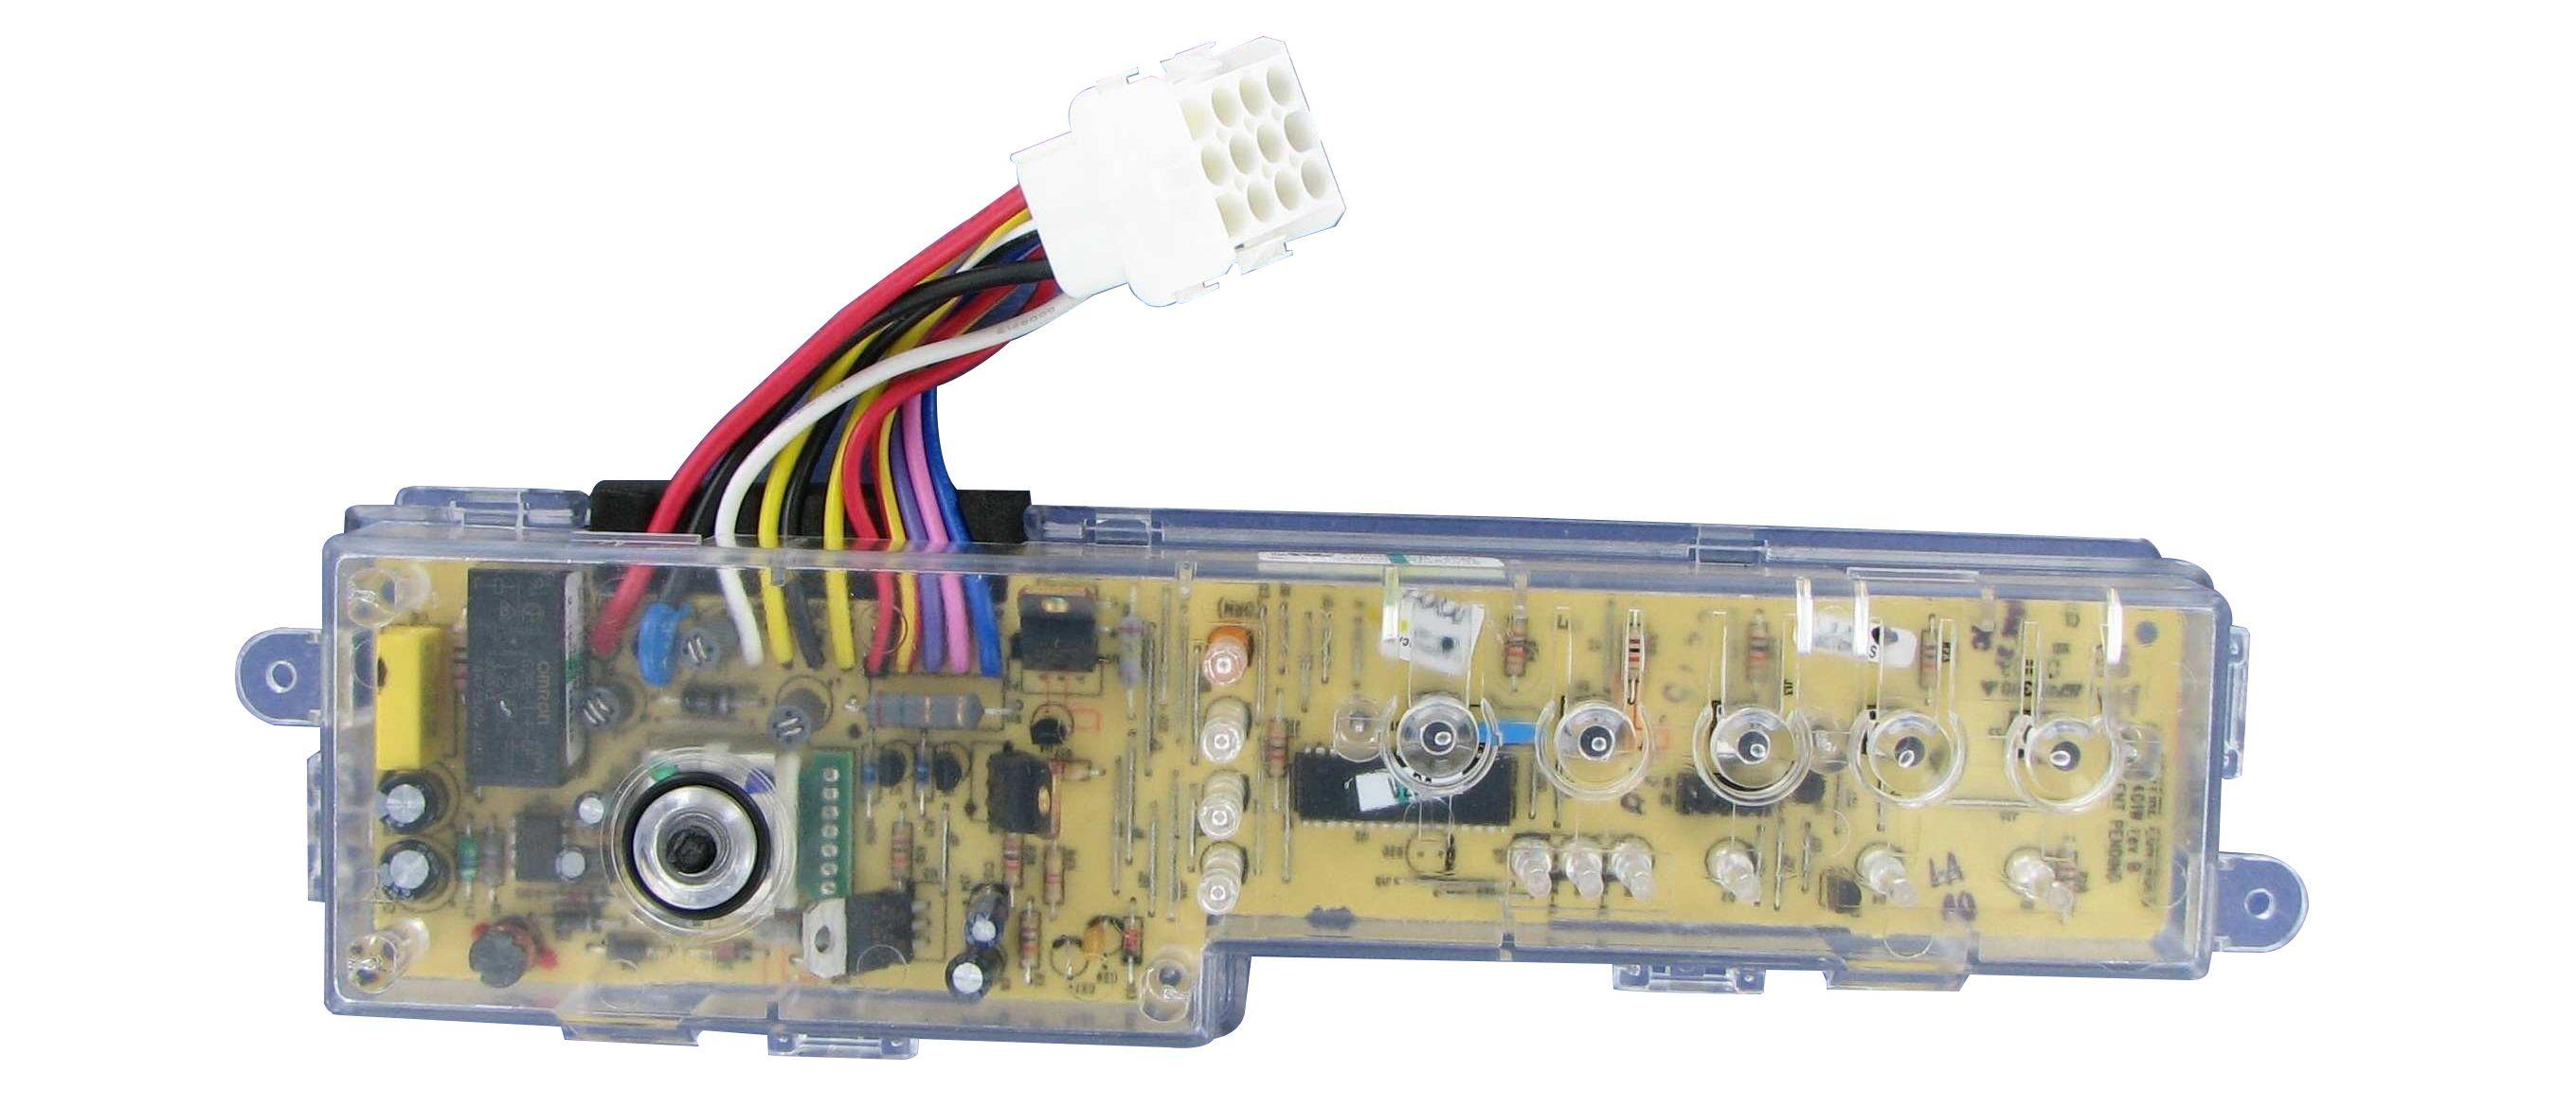 Frigidaire Electrolux Kenmore 154568301 Dishwasher Control Board Frigidaire Boards Broken Appliance